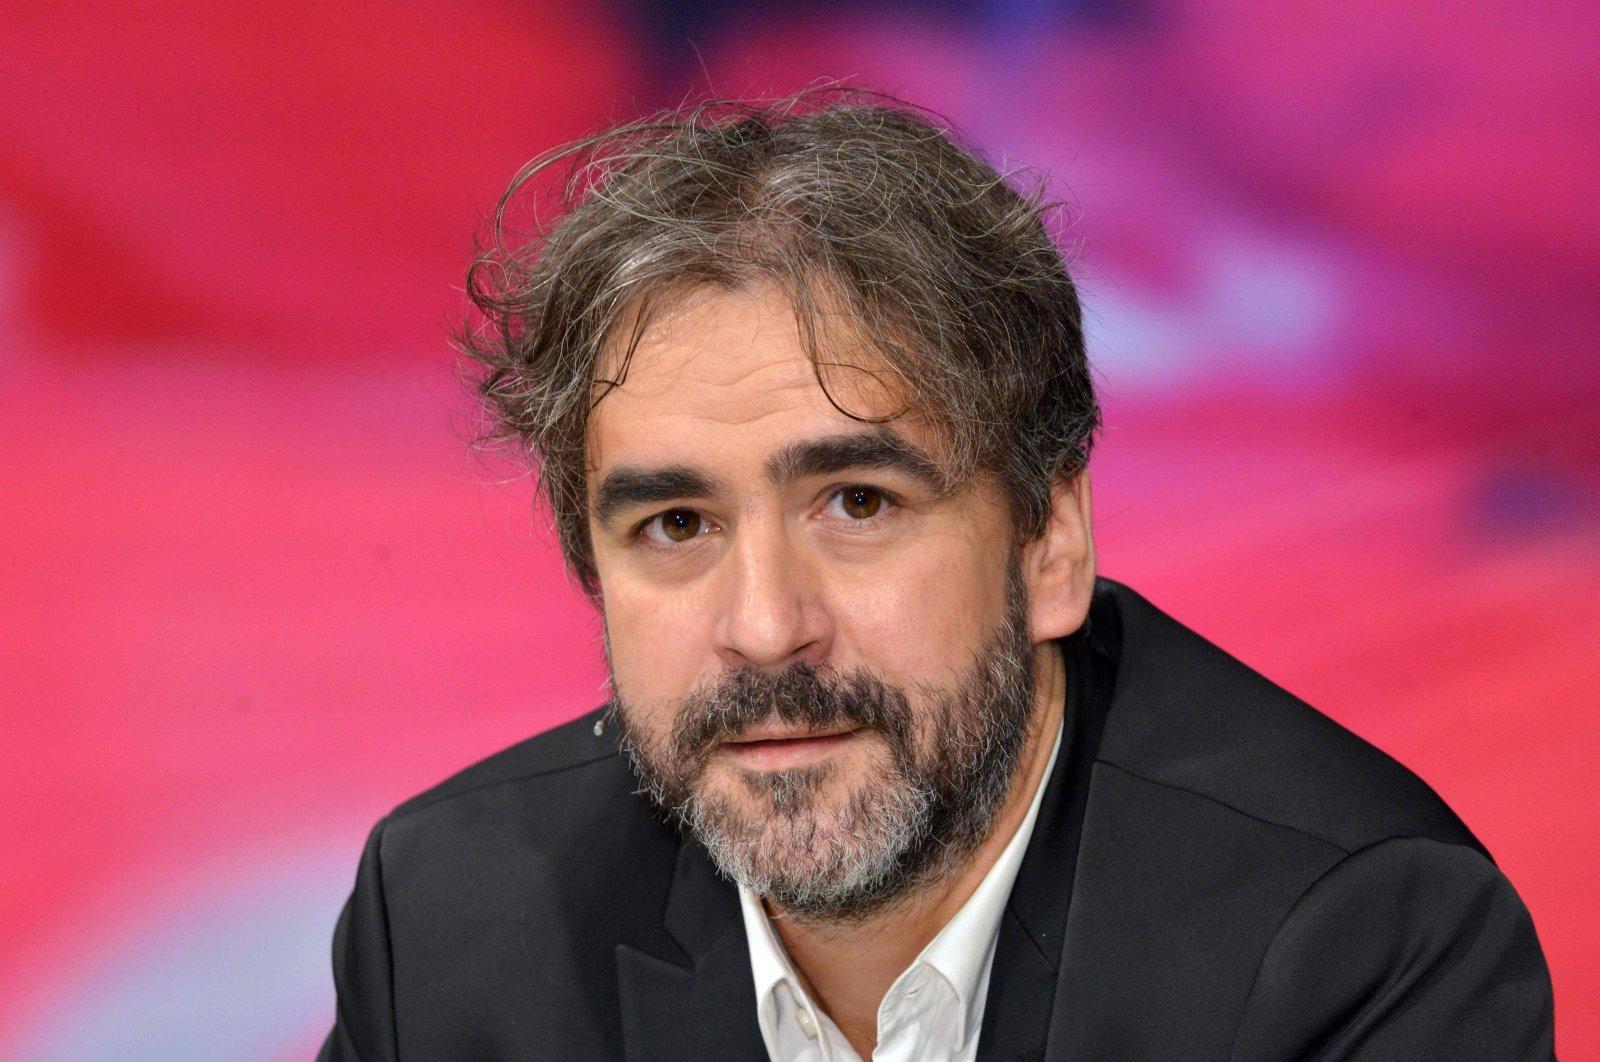 Deniz Yücel attends a TV show, in Berlin, Germany, July 21, 2016. (AFP Photo)